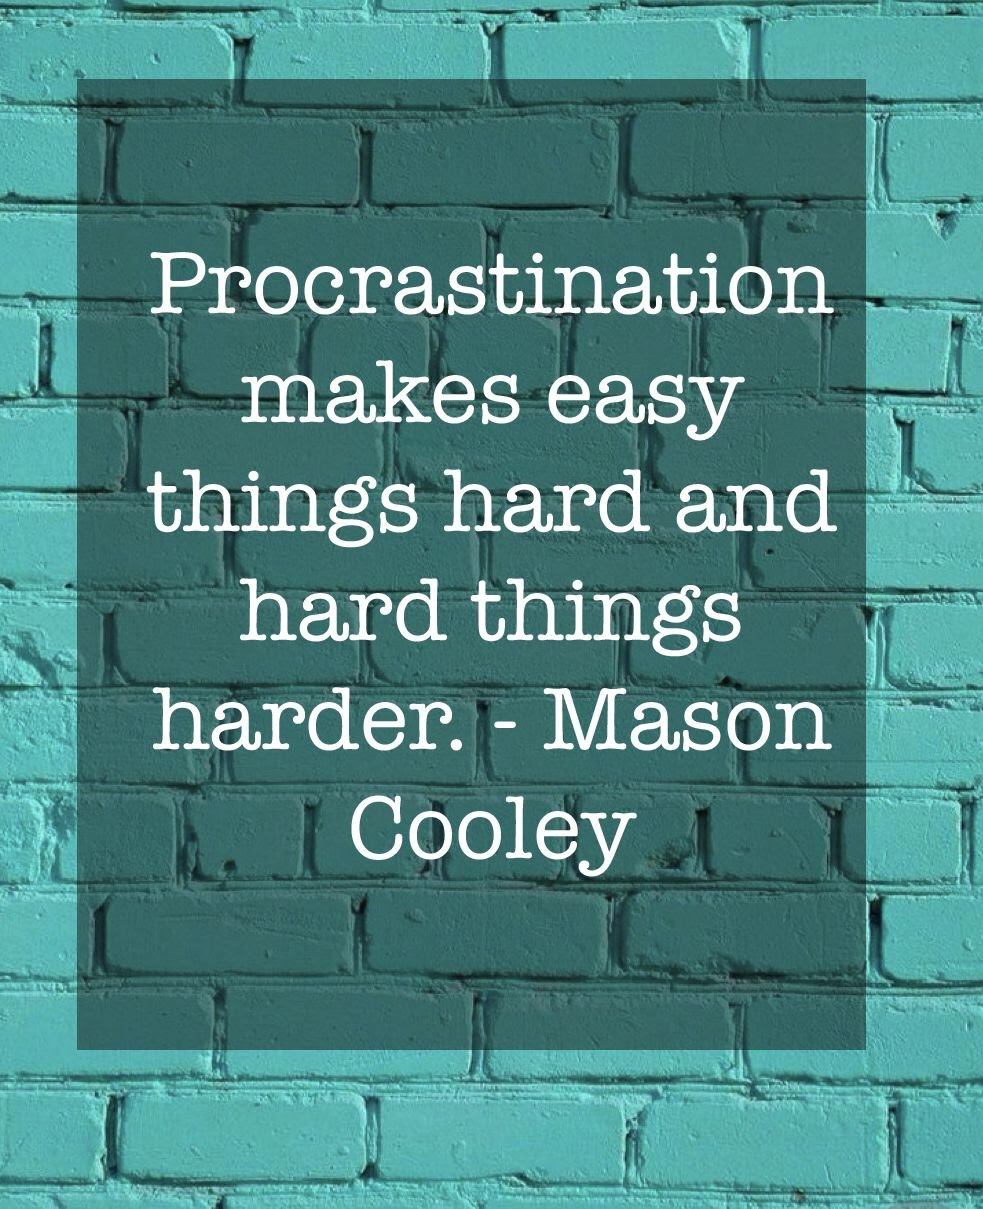 Motivation against procrastination